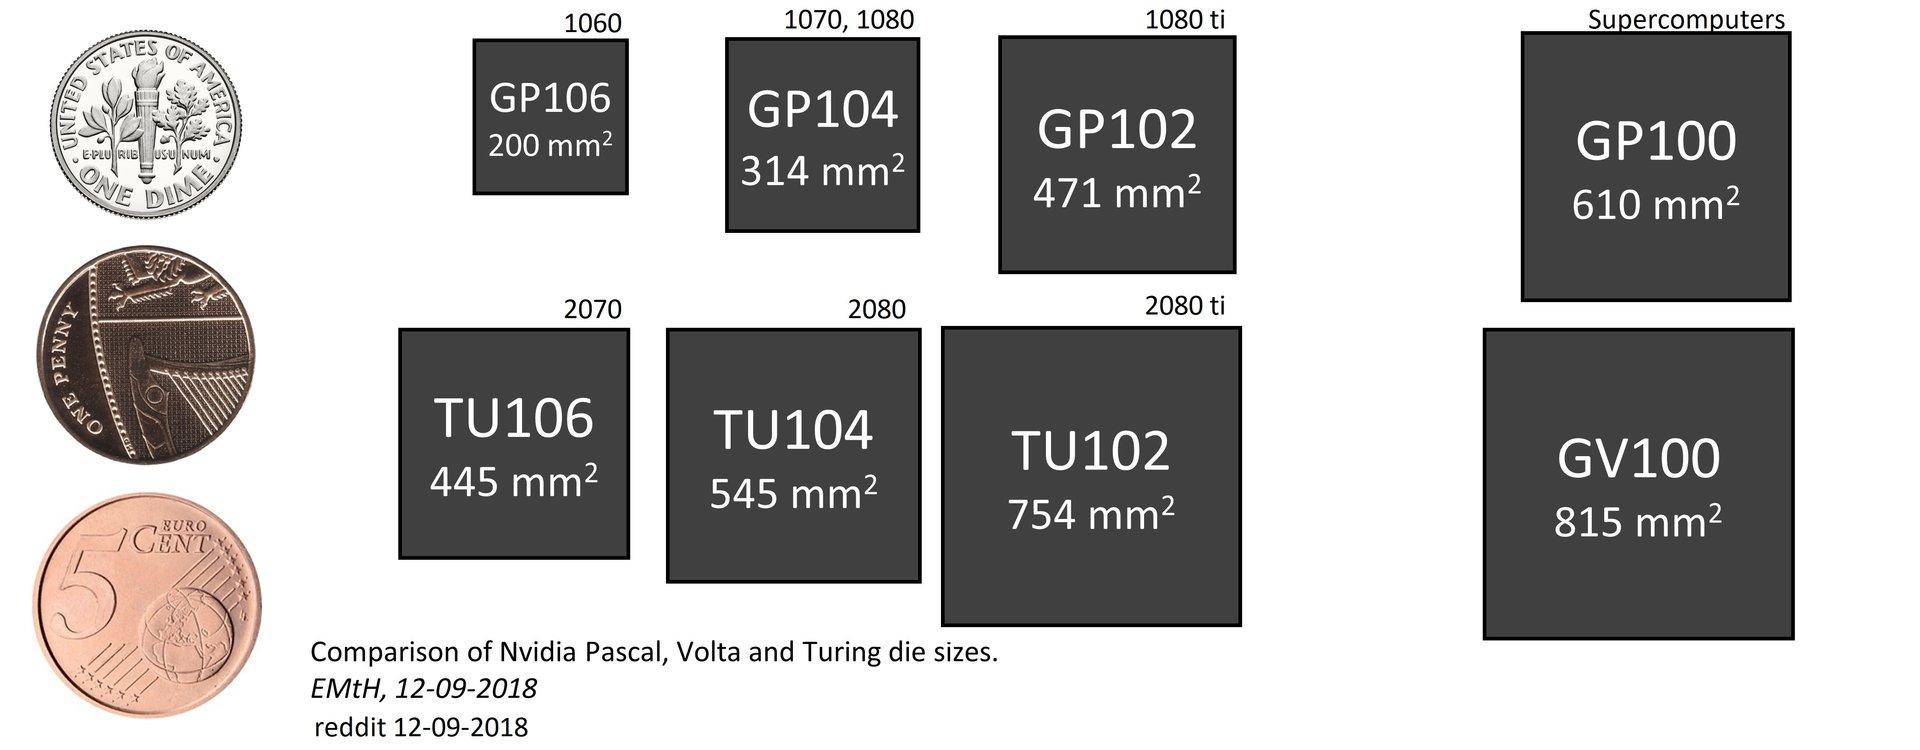 Größenvergleich: Nvidia Turing versus Pascal